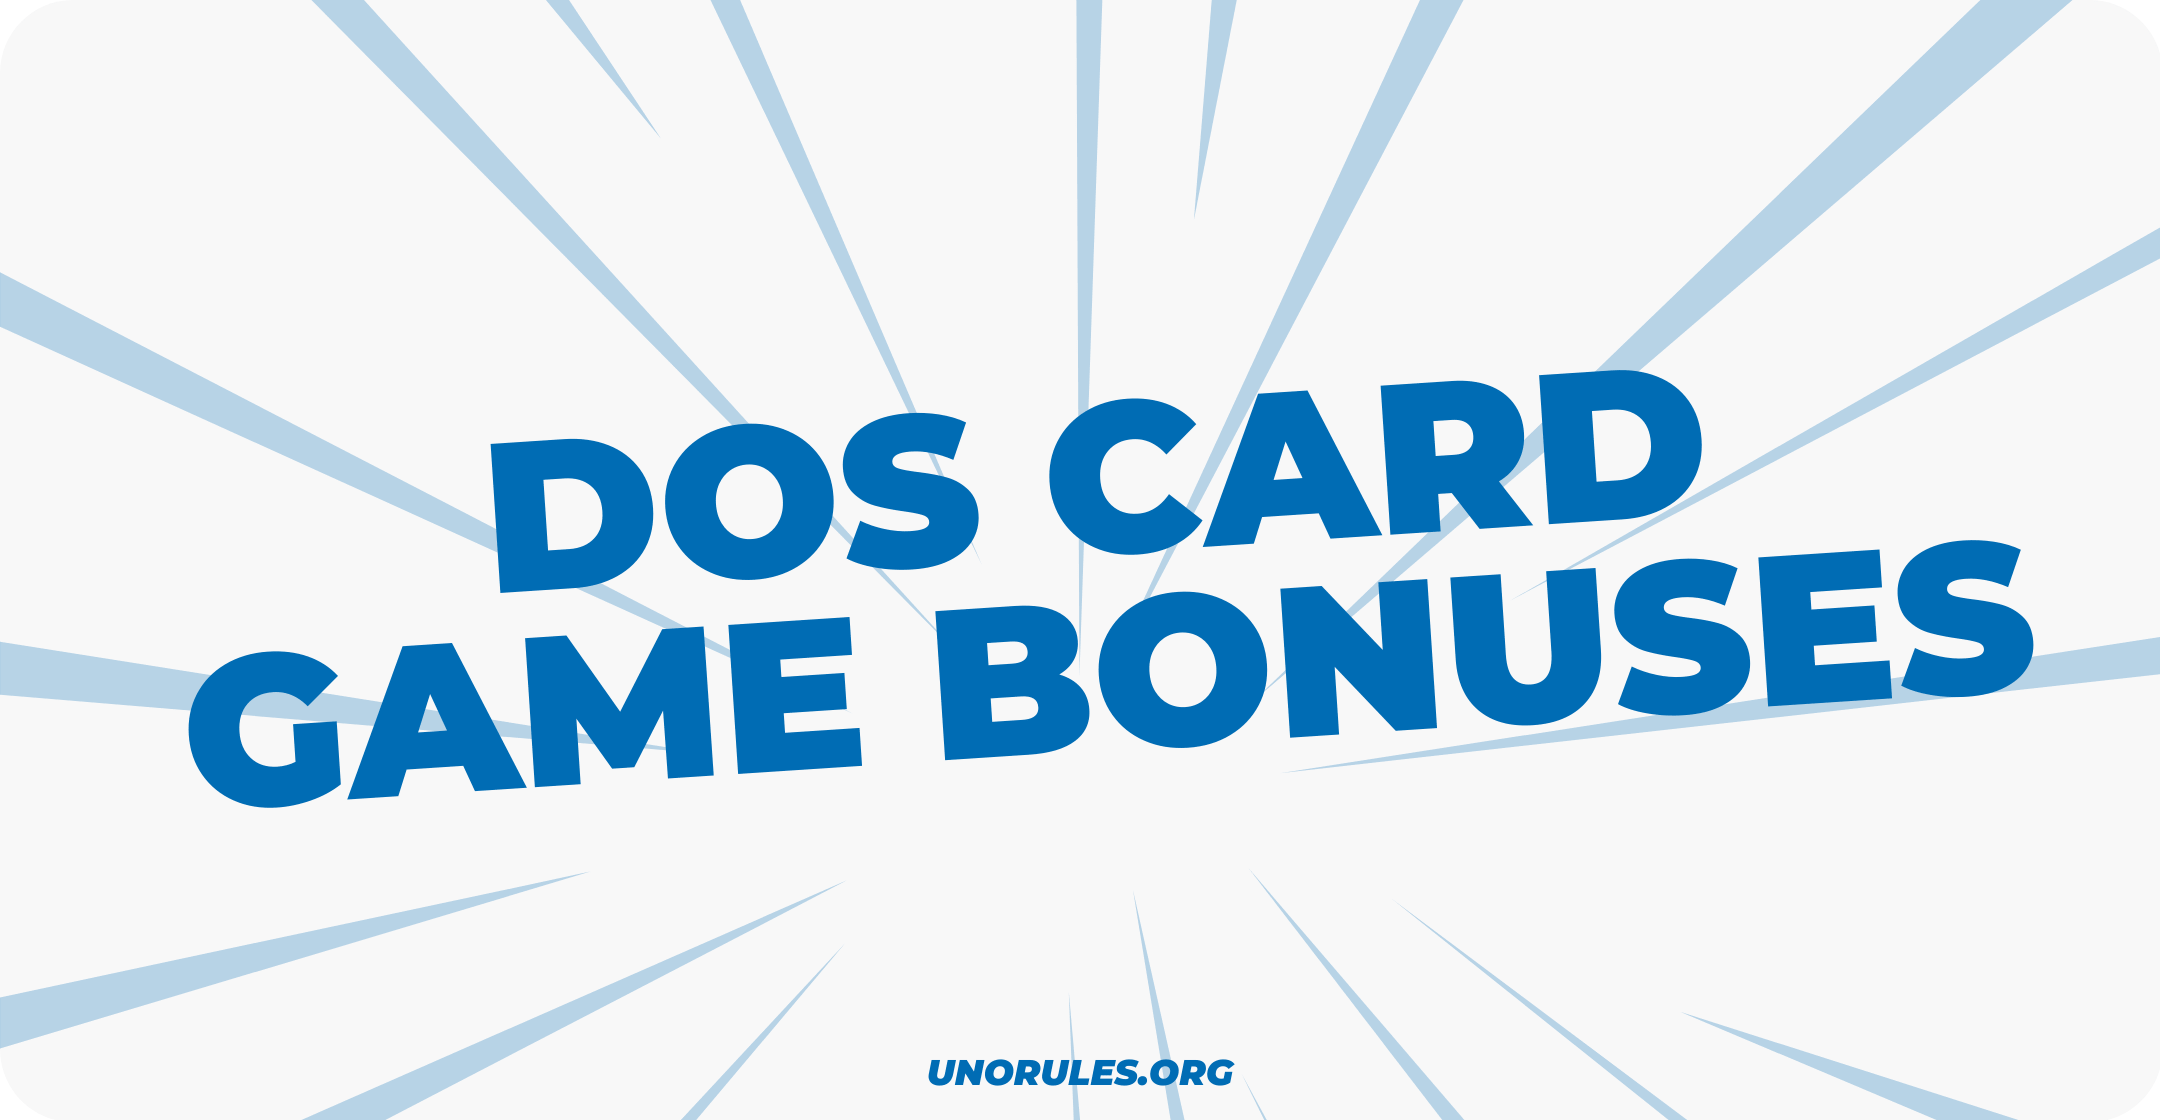 Dos card game bonuses